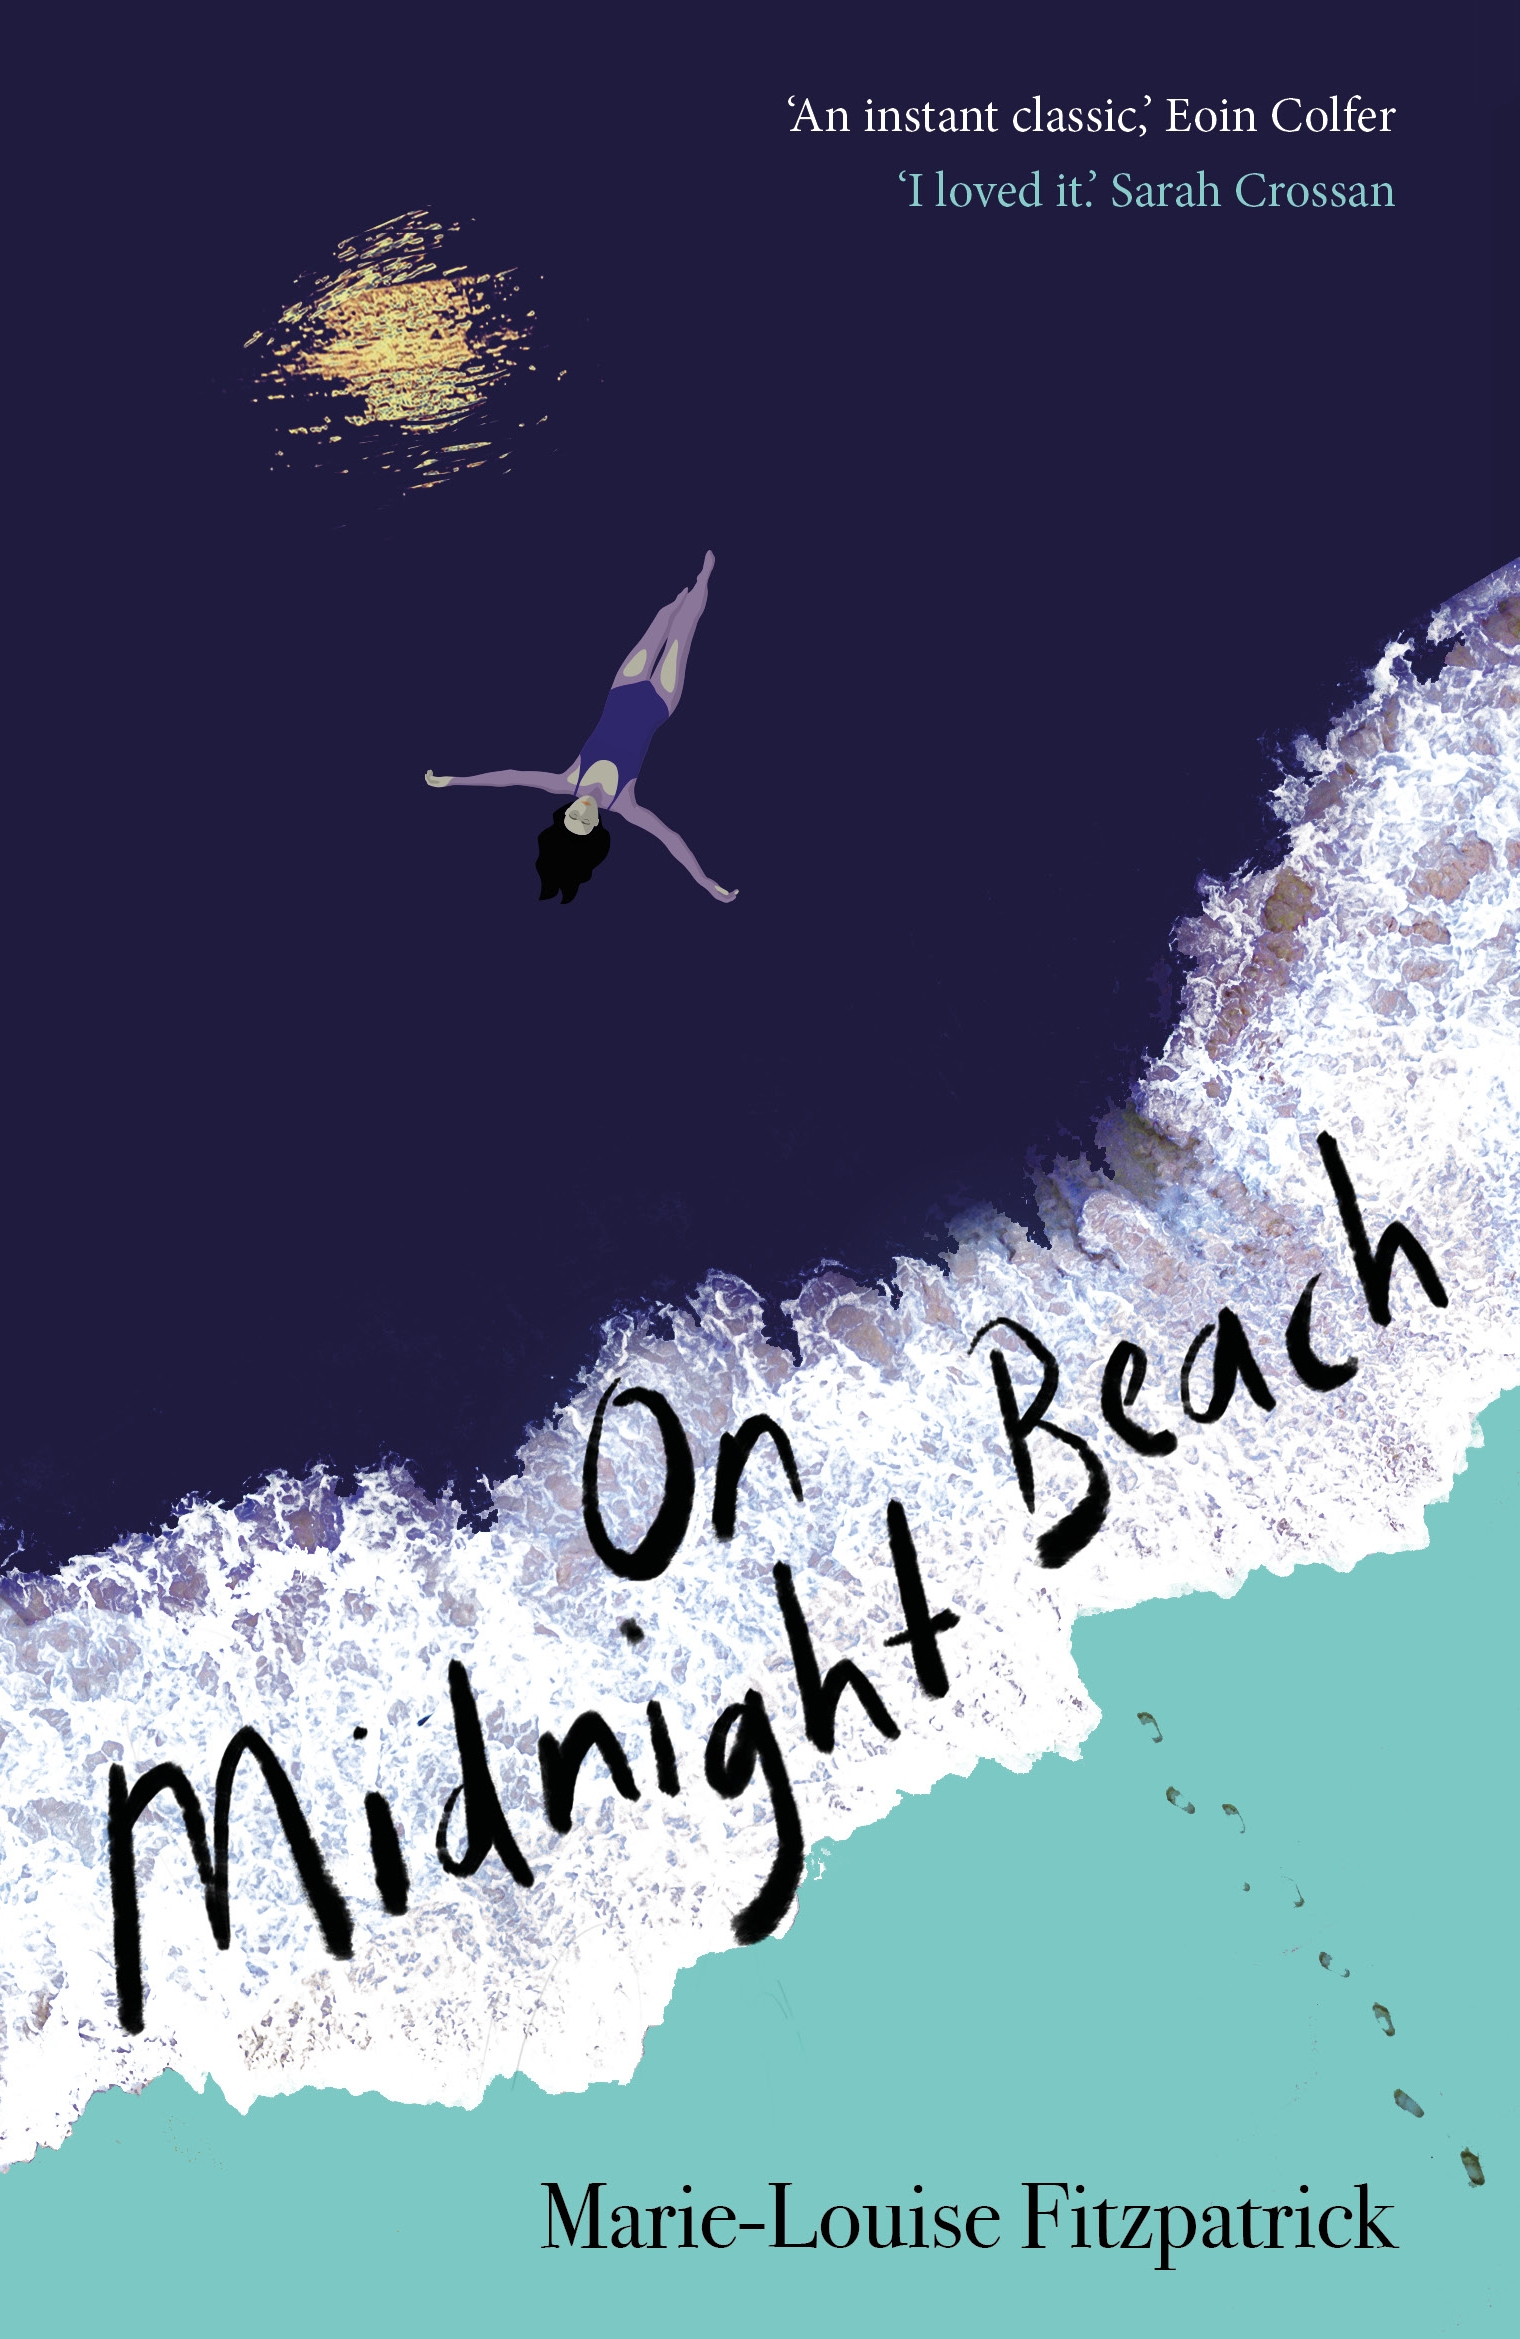 https://carnegiegreenaway.org.uk/wp-content/uploads/2021/02/On-Midnight-Beach-Cover-CG.jpg